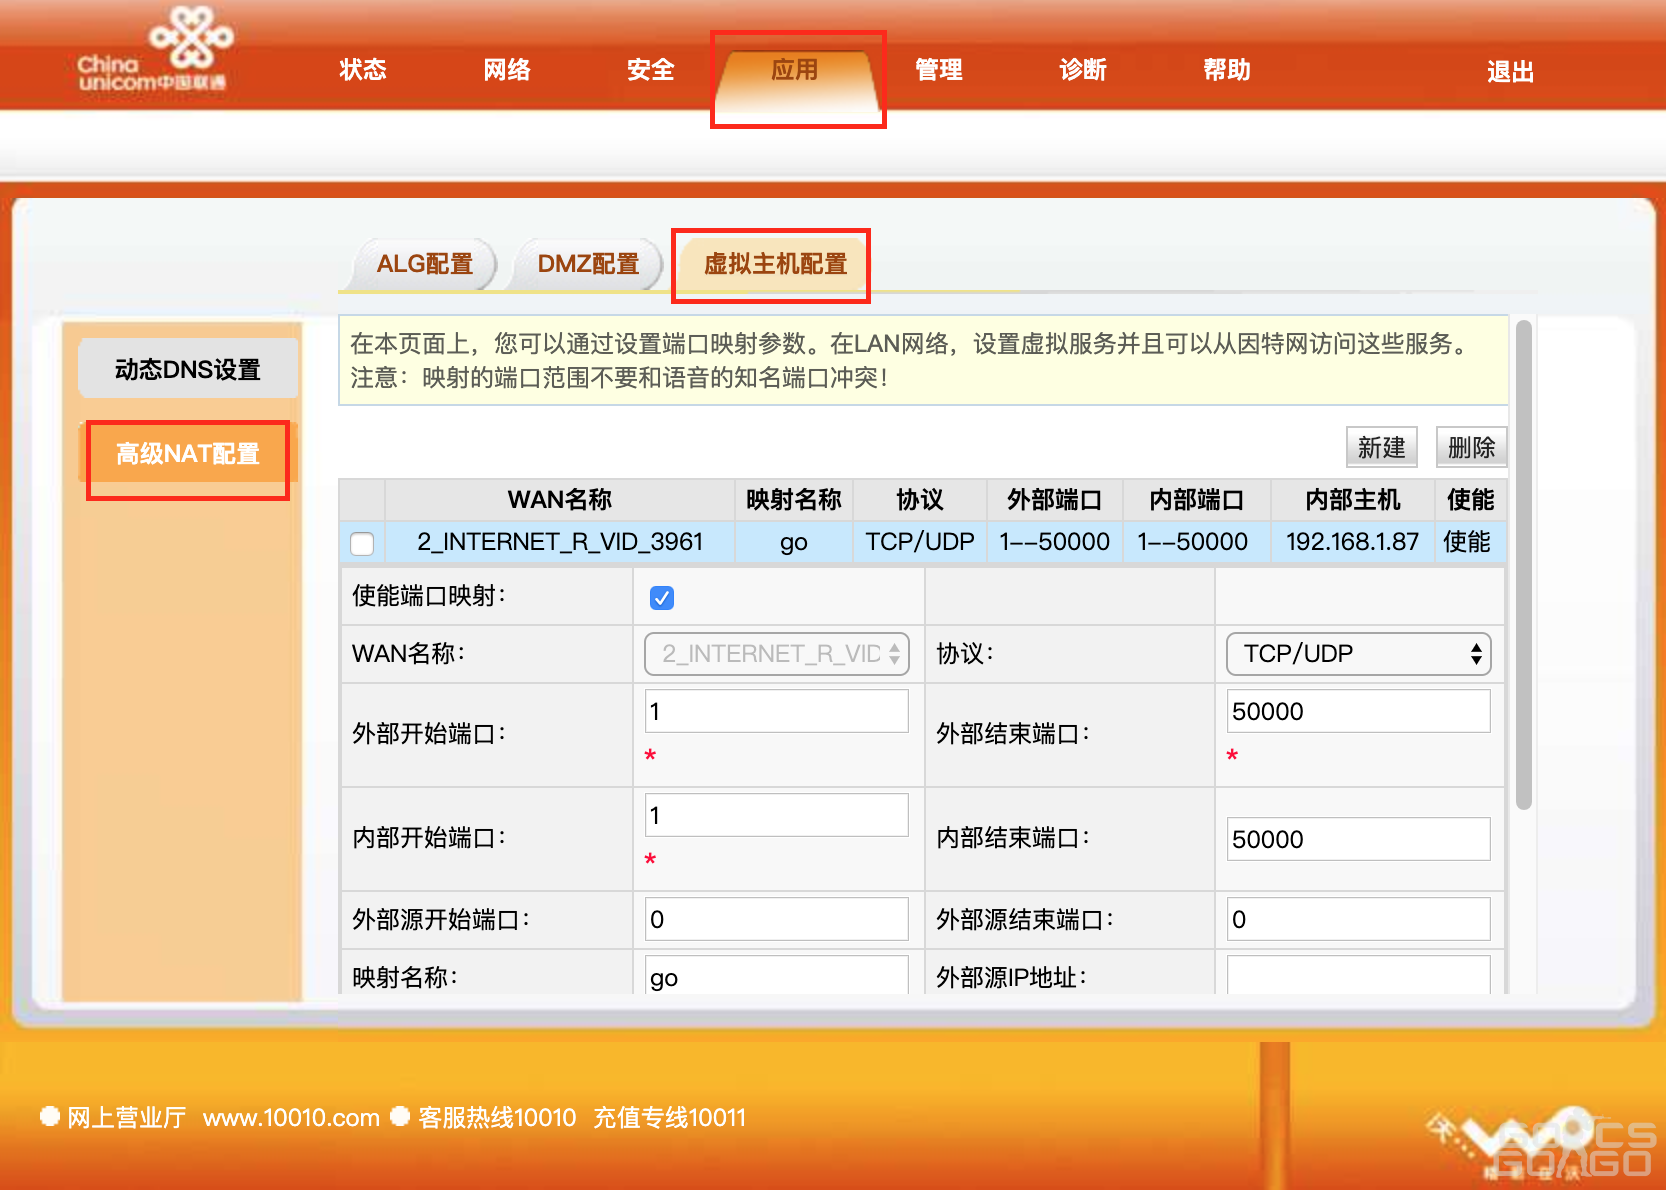 CSGO服务器公网访问端口映射